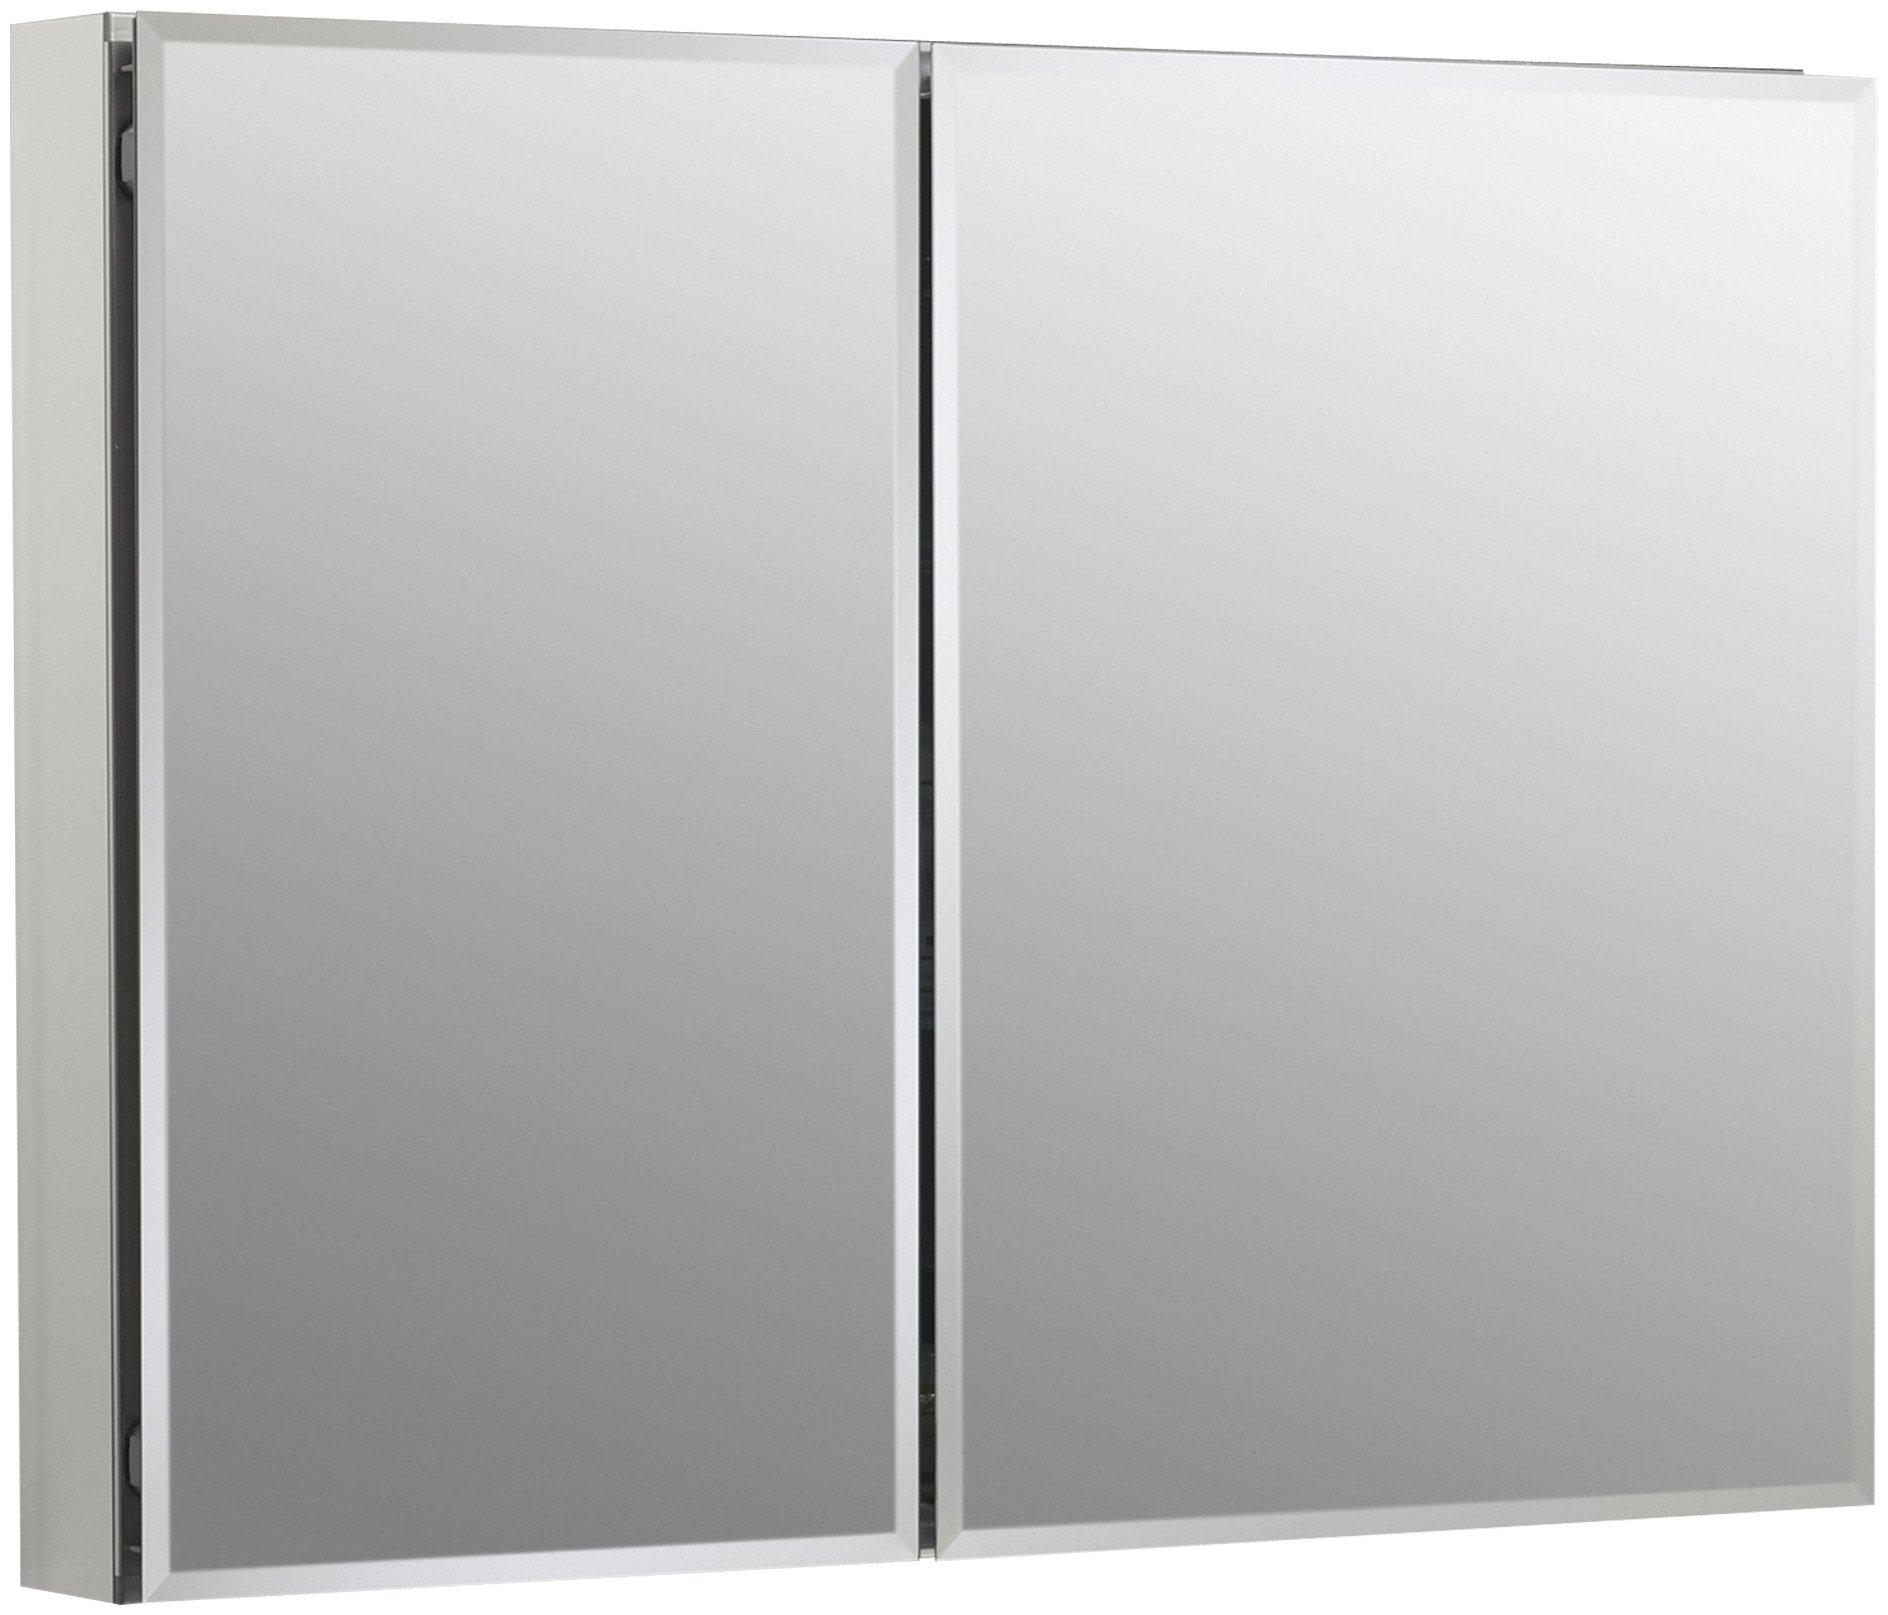 KOHLER K-CB-CLC3526FS Frameless Double Door 35 inch x 26 inch Aluminum Bathroom Medicine Cabinet; Recess or Surface Mount by Kohler